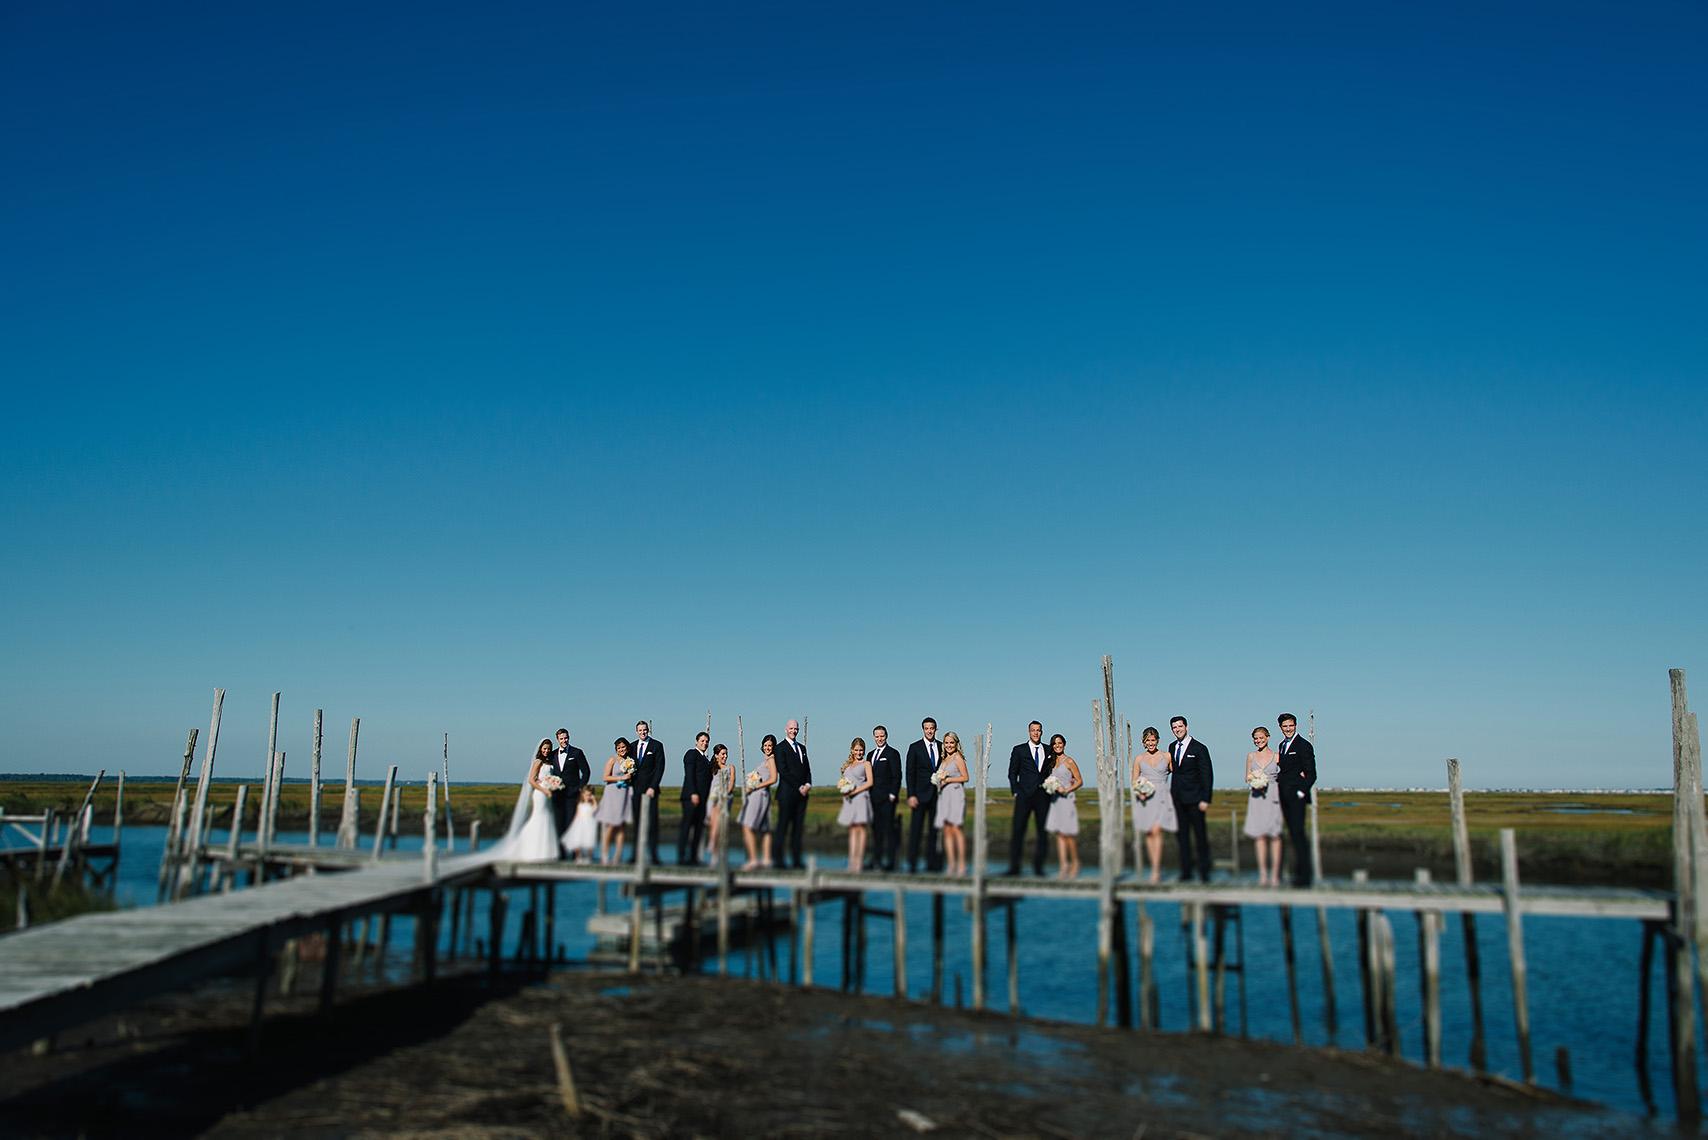 john-schnack-cape-may-destination-wedding-photographer-10.jpg